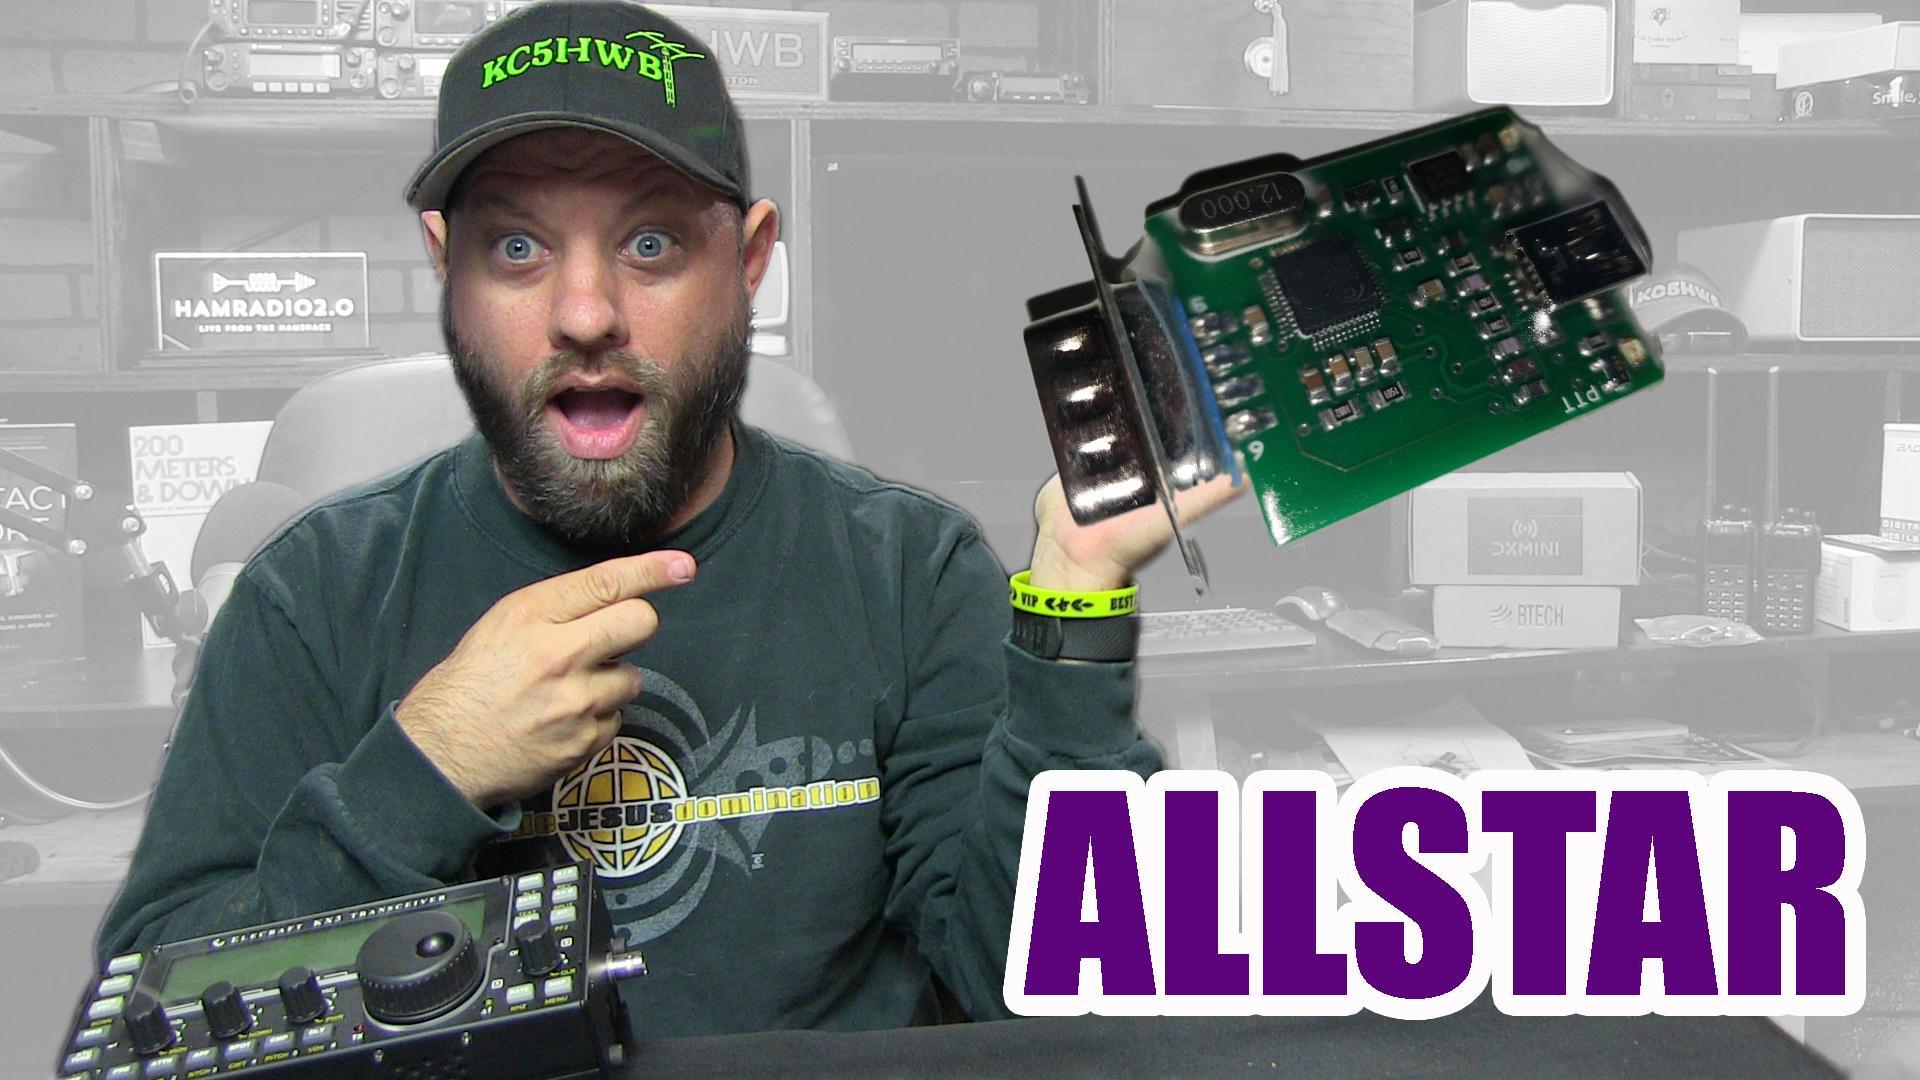 Episode 244: Allstar Node Demonstration with RIM-Alinco